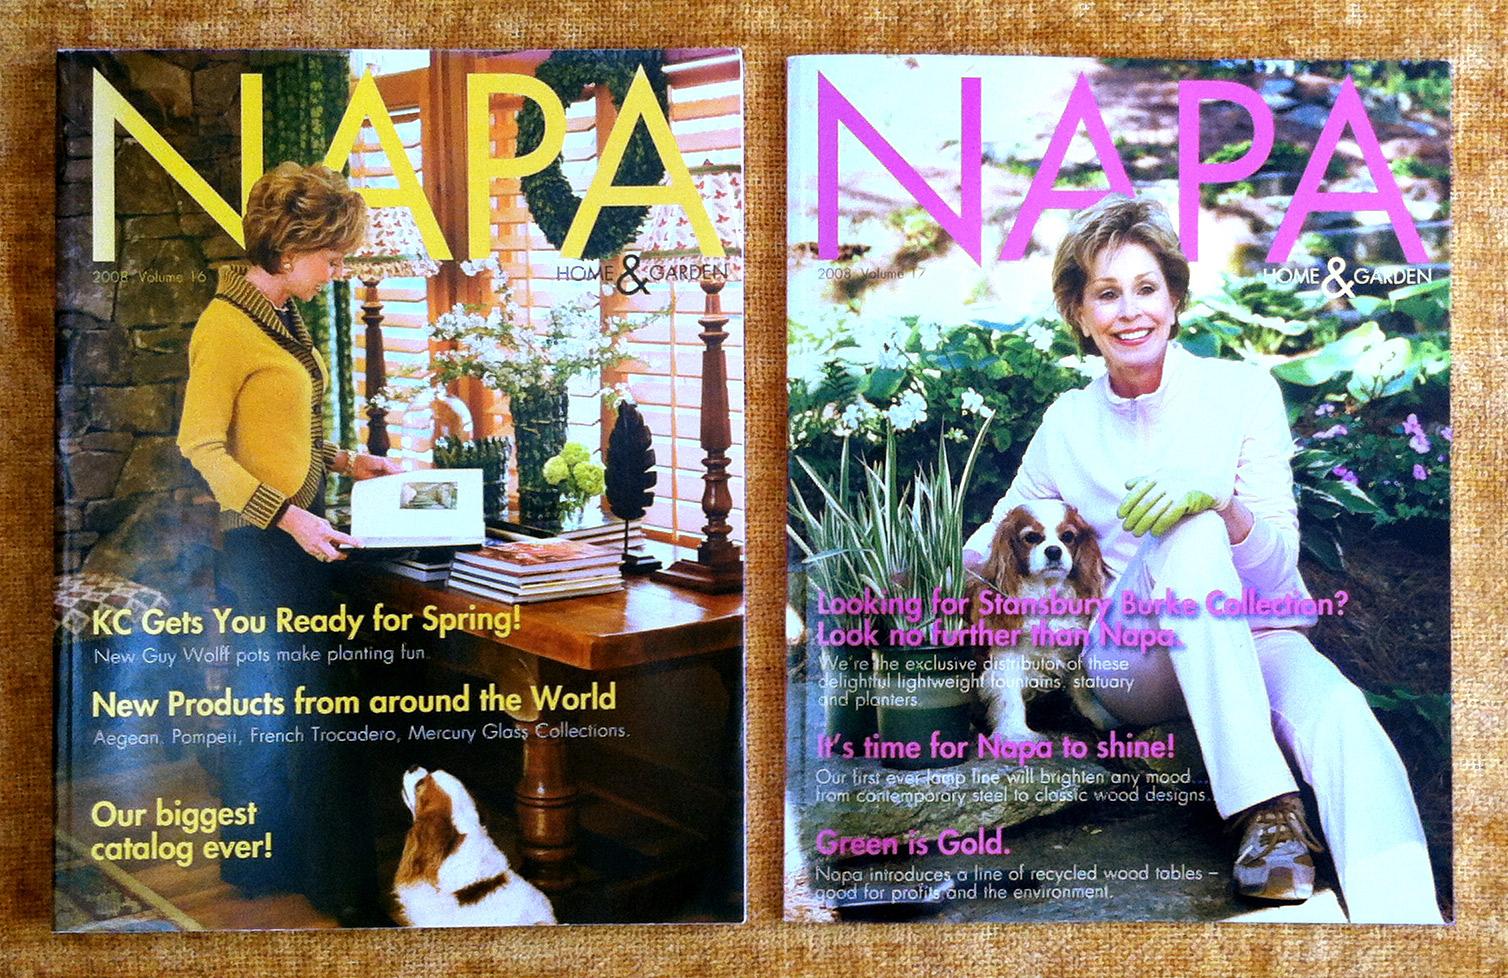 Napa_Magazine_2008_web.jpg